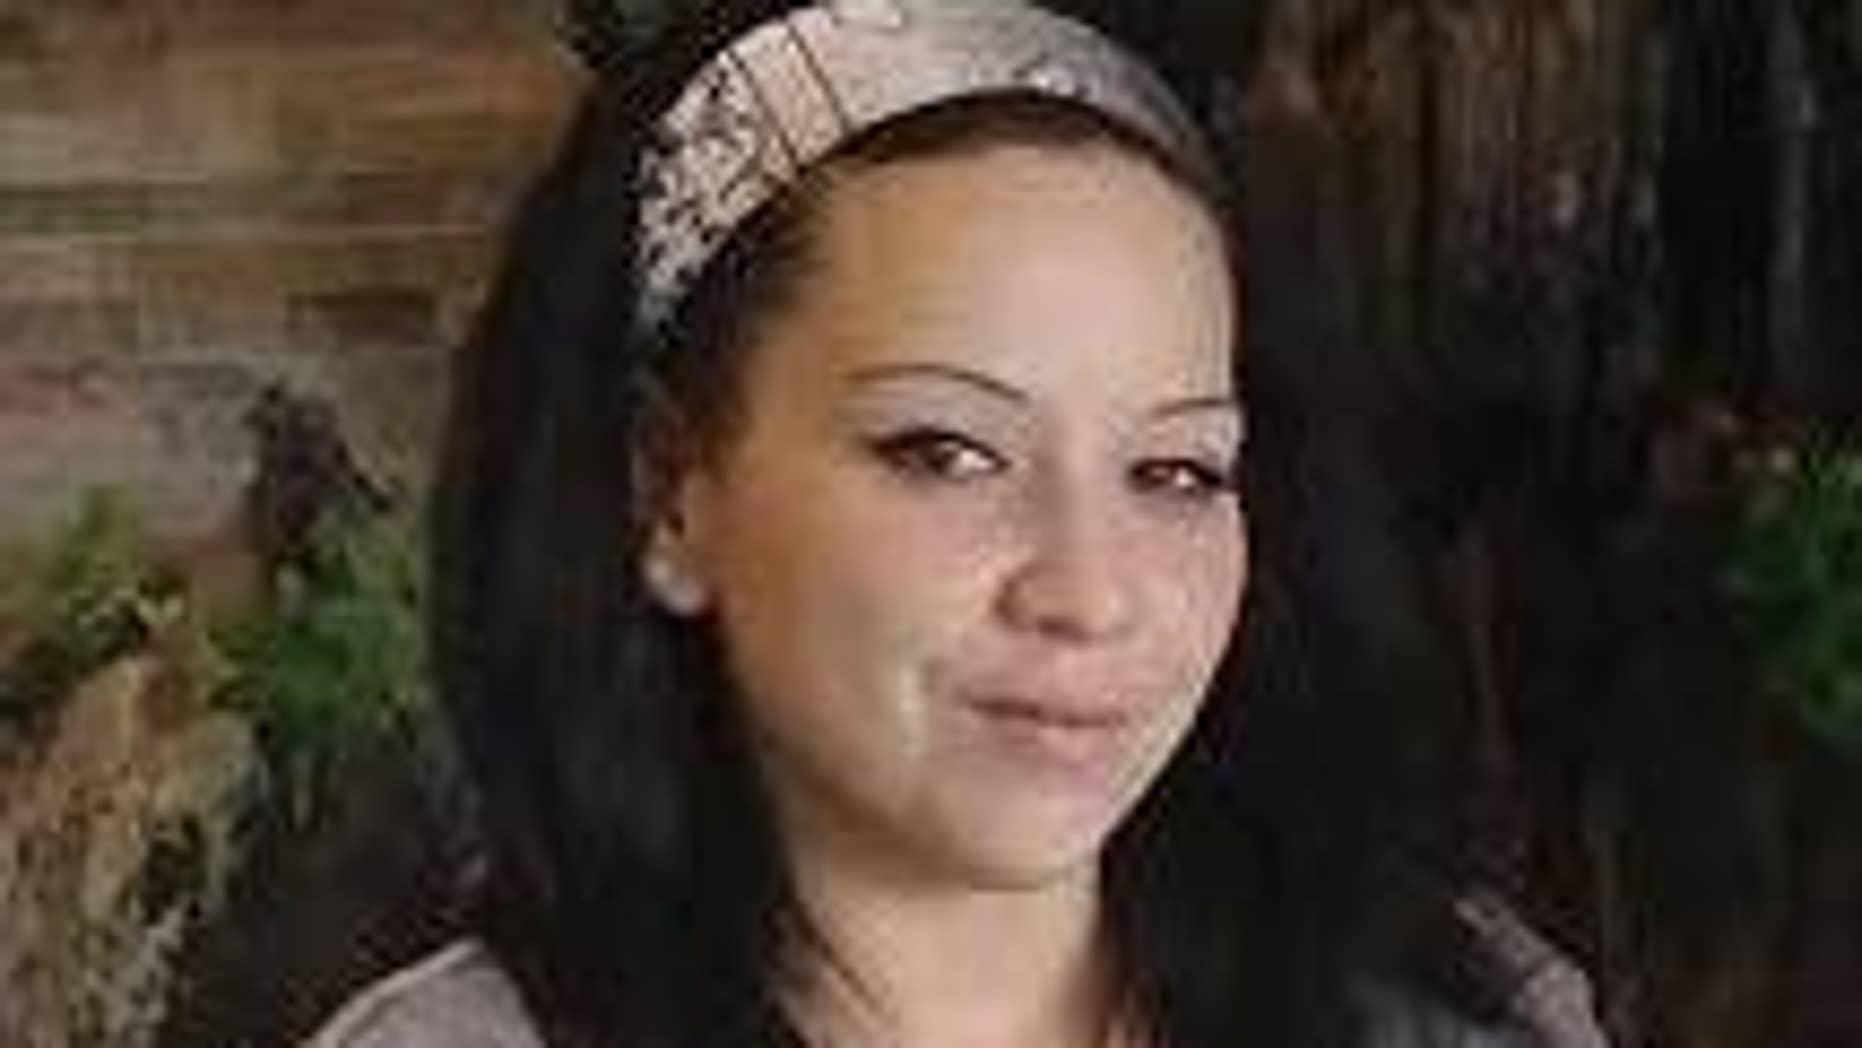 Police in Bridgeville, Pa., are seeking Latoya Marie Rosiek. Bridgeville Police Chief Chad King has encouraged her to turn herself in.